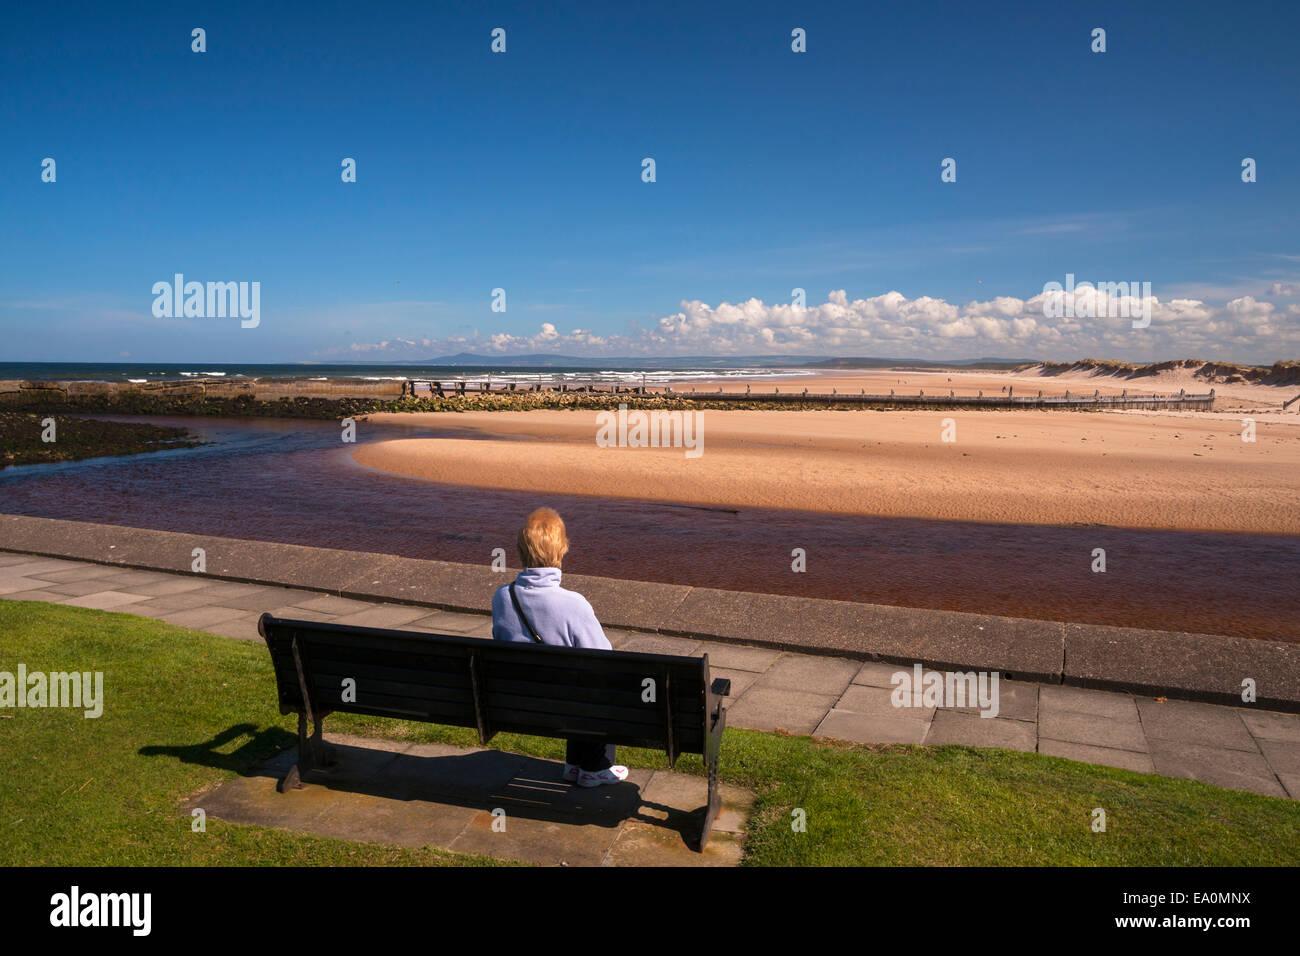 Lossiemouth beach, Murray, Scotland, UK - Stock Image